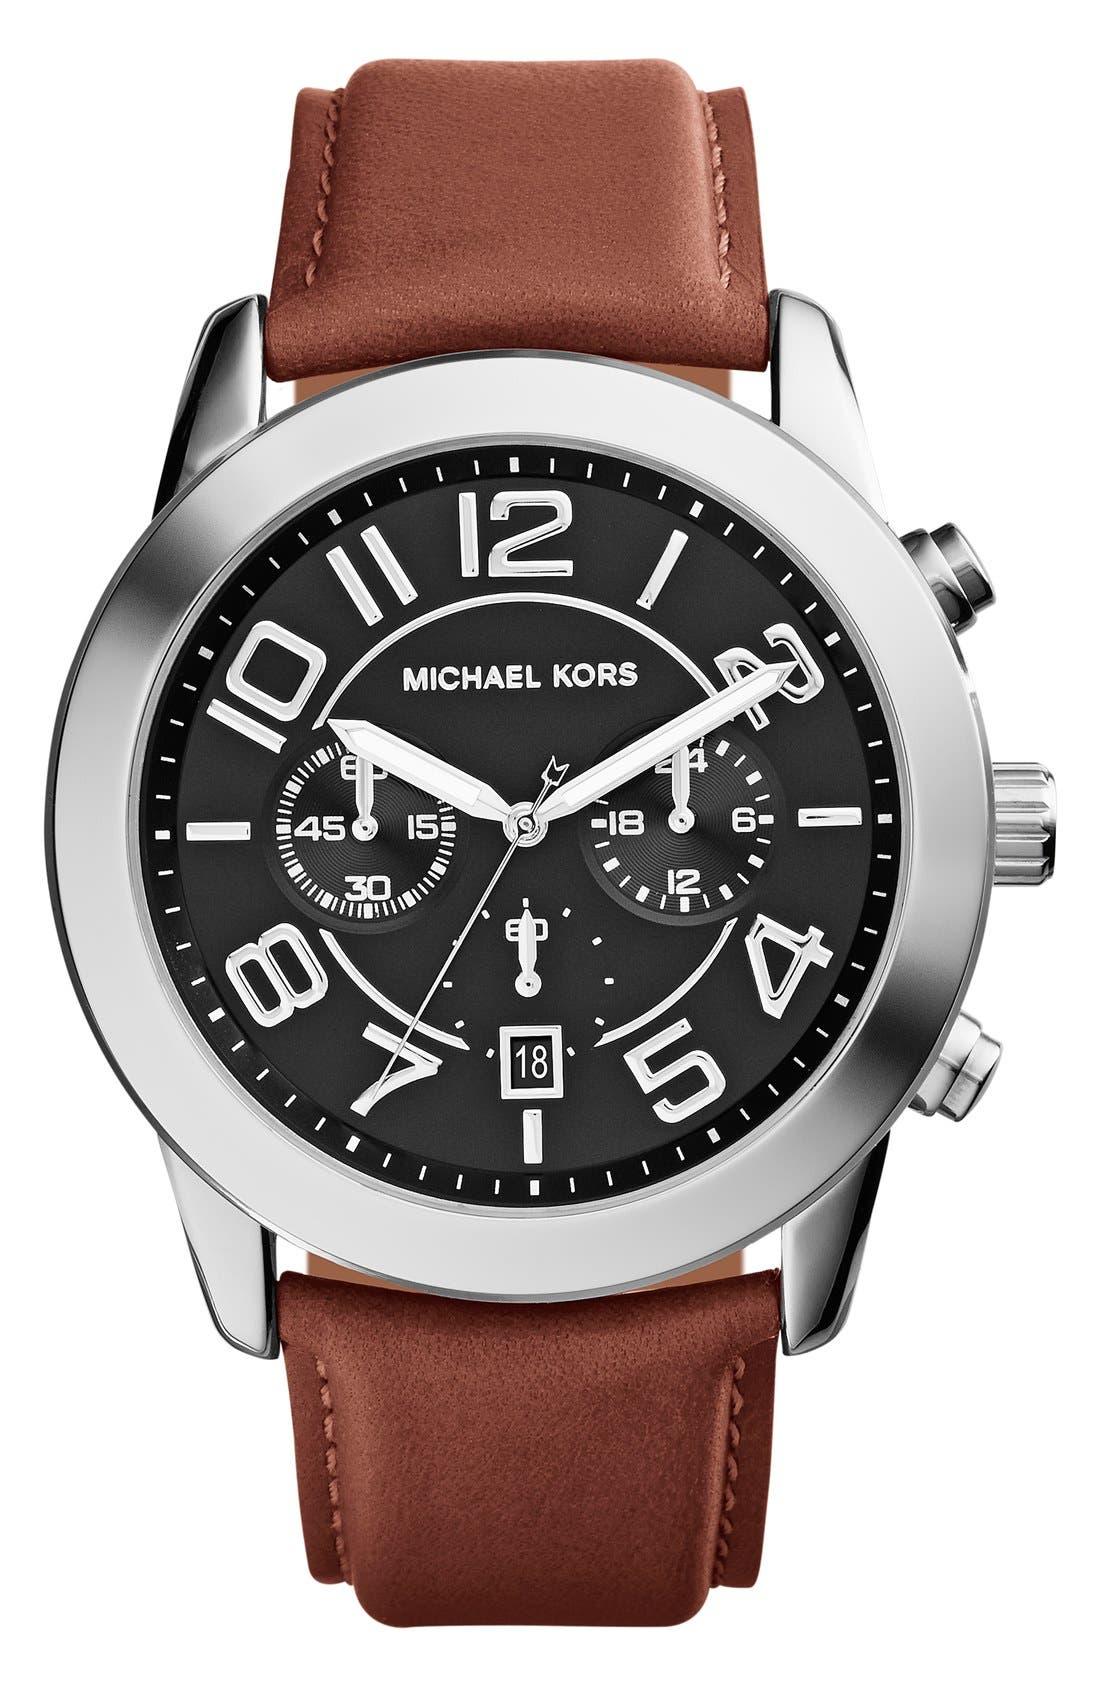 Main Image - Michael Kors 'Mercer' Large Chronograph Leather Strap Watch, 45mm